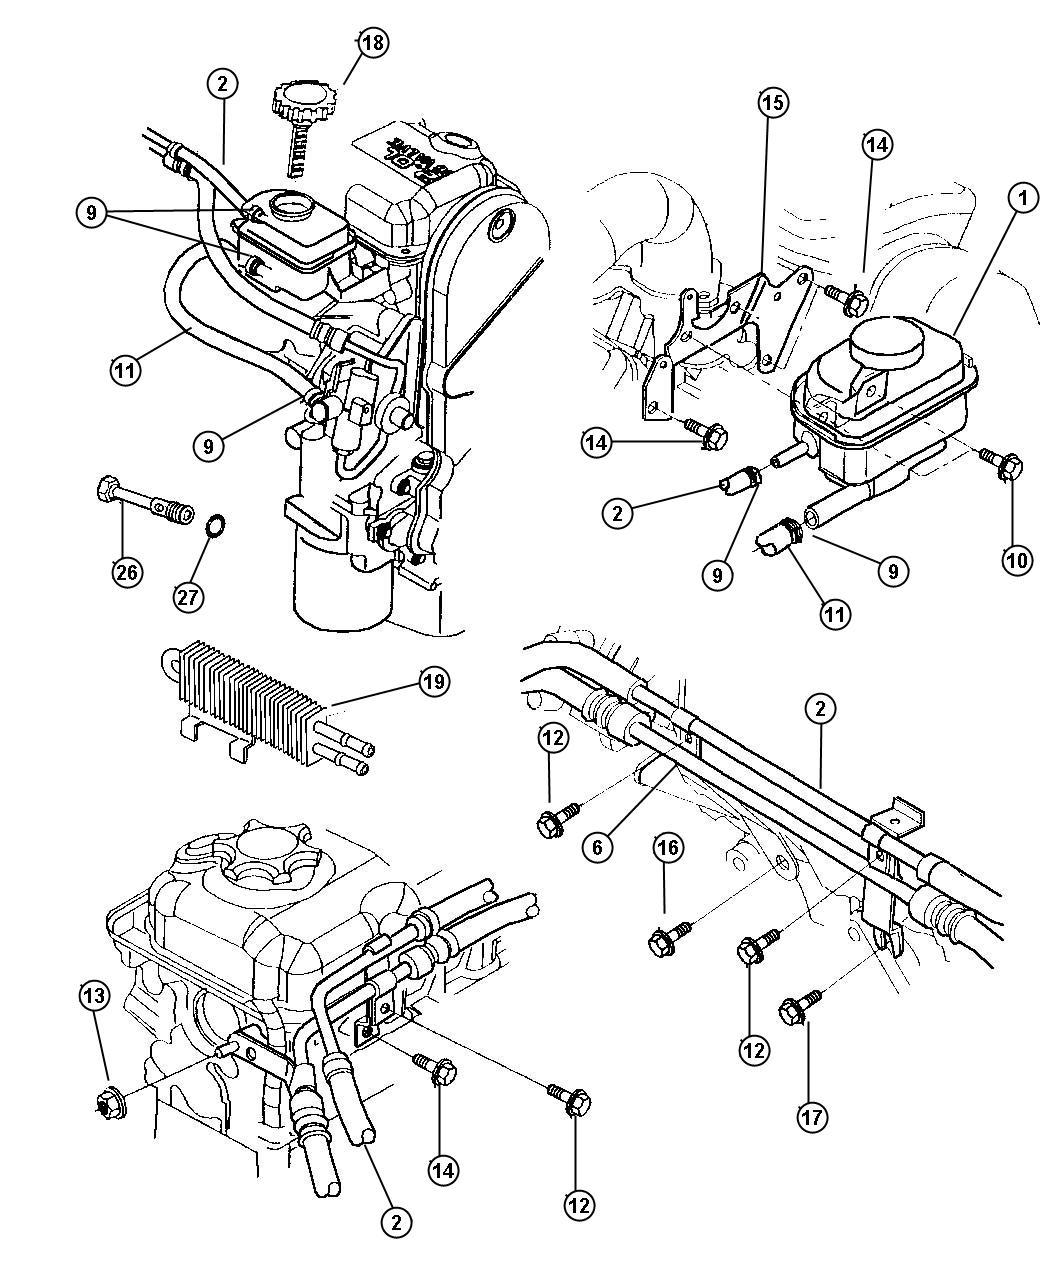 Dodge Dakota Reservoir Power Steering Pump With Cap